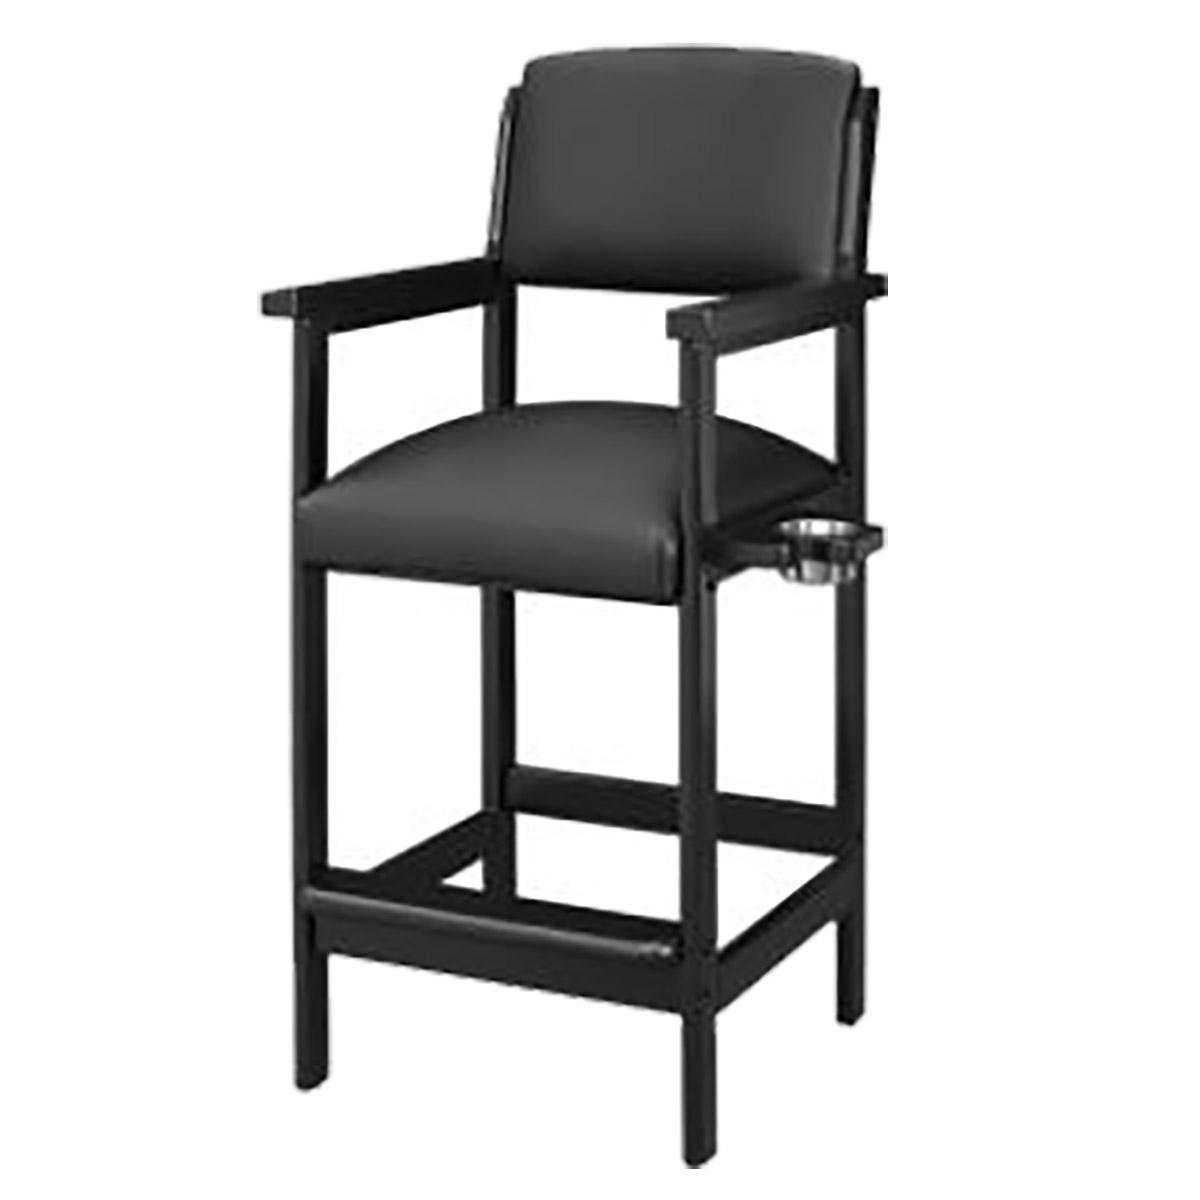 Merveilleux Black Billiard Spectator Chair